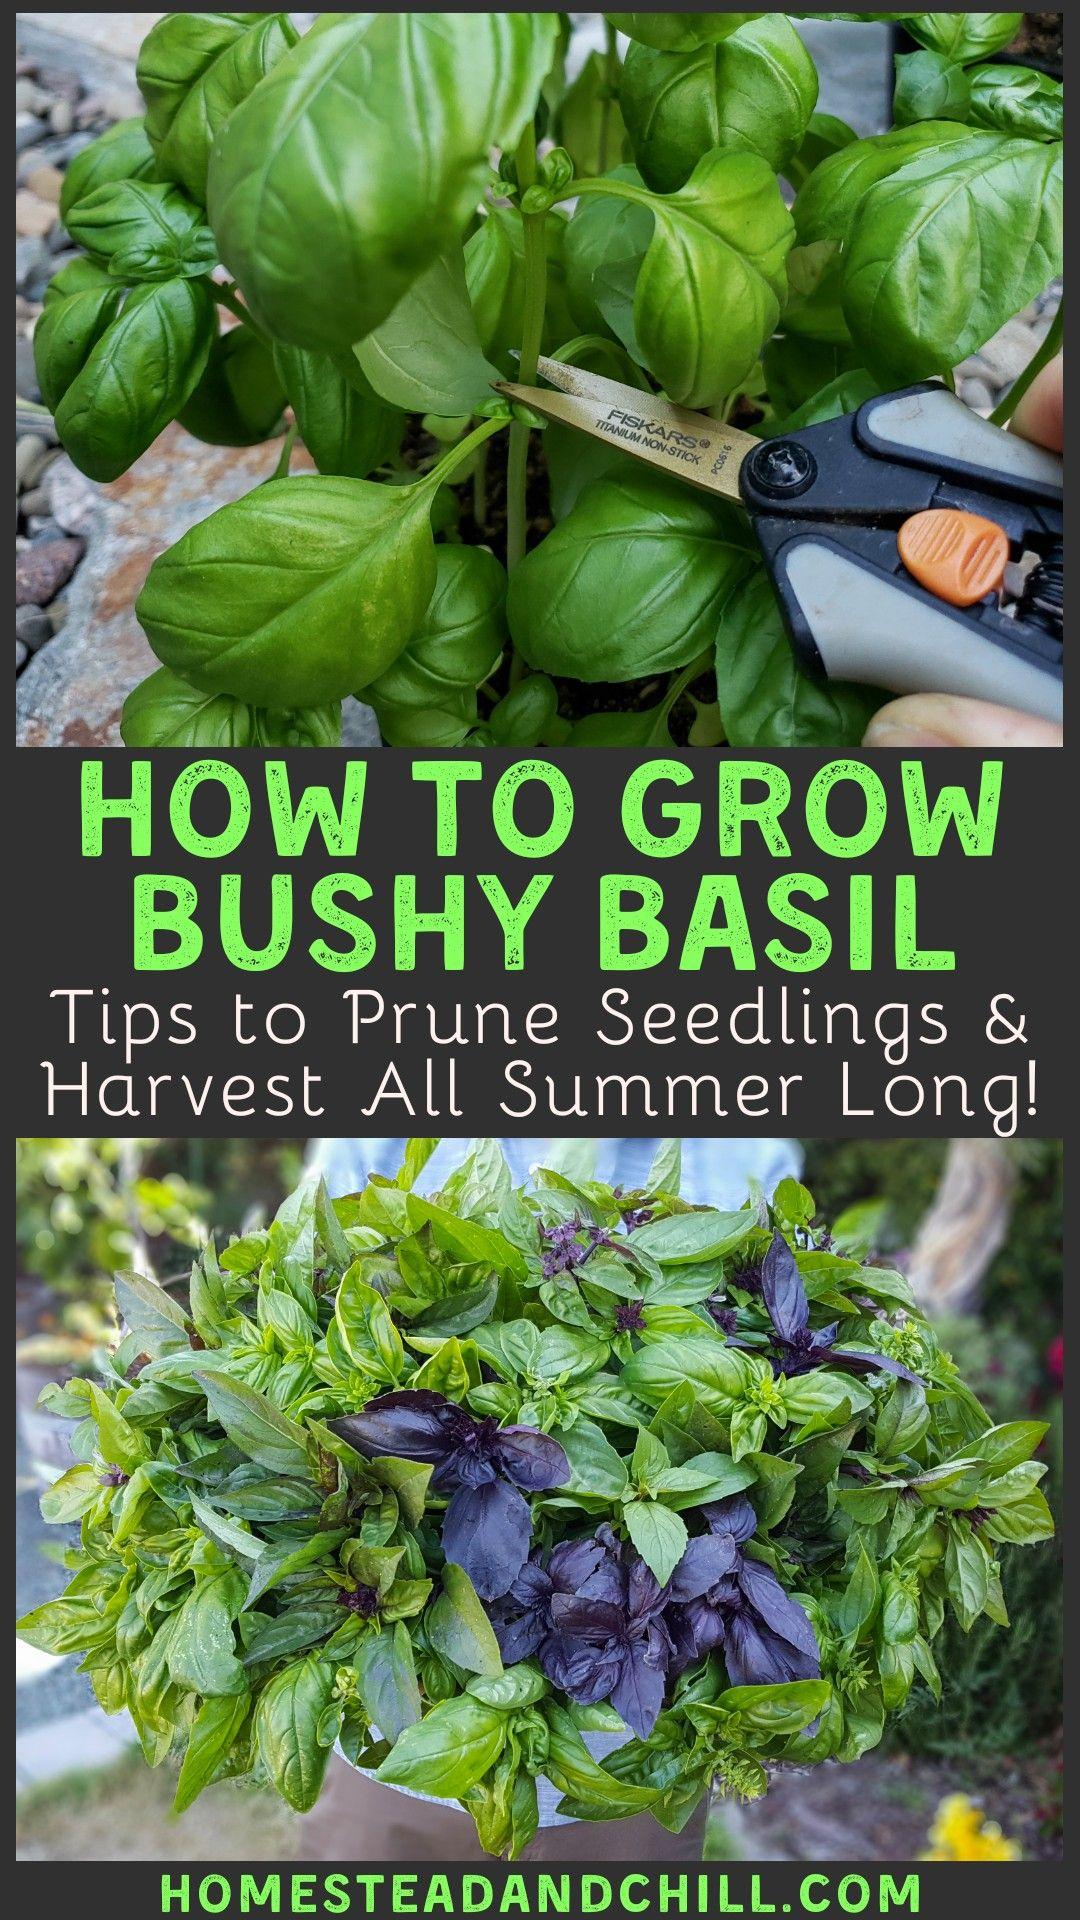 How To Grow Bushy Basil To Harvest All Summer Long Homestead And Chill In 2020 Basil Plant Veg Garden Herb Garden Design